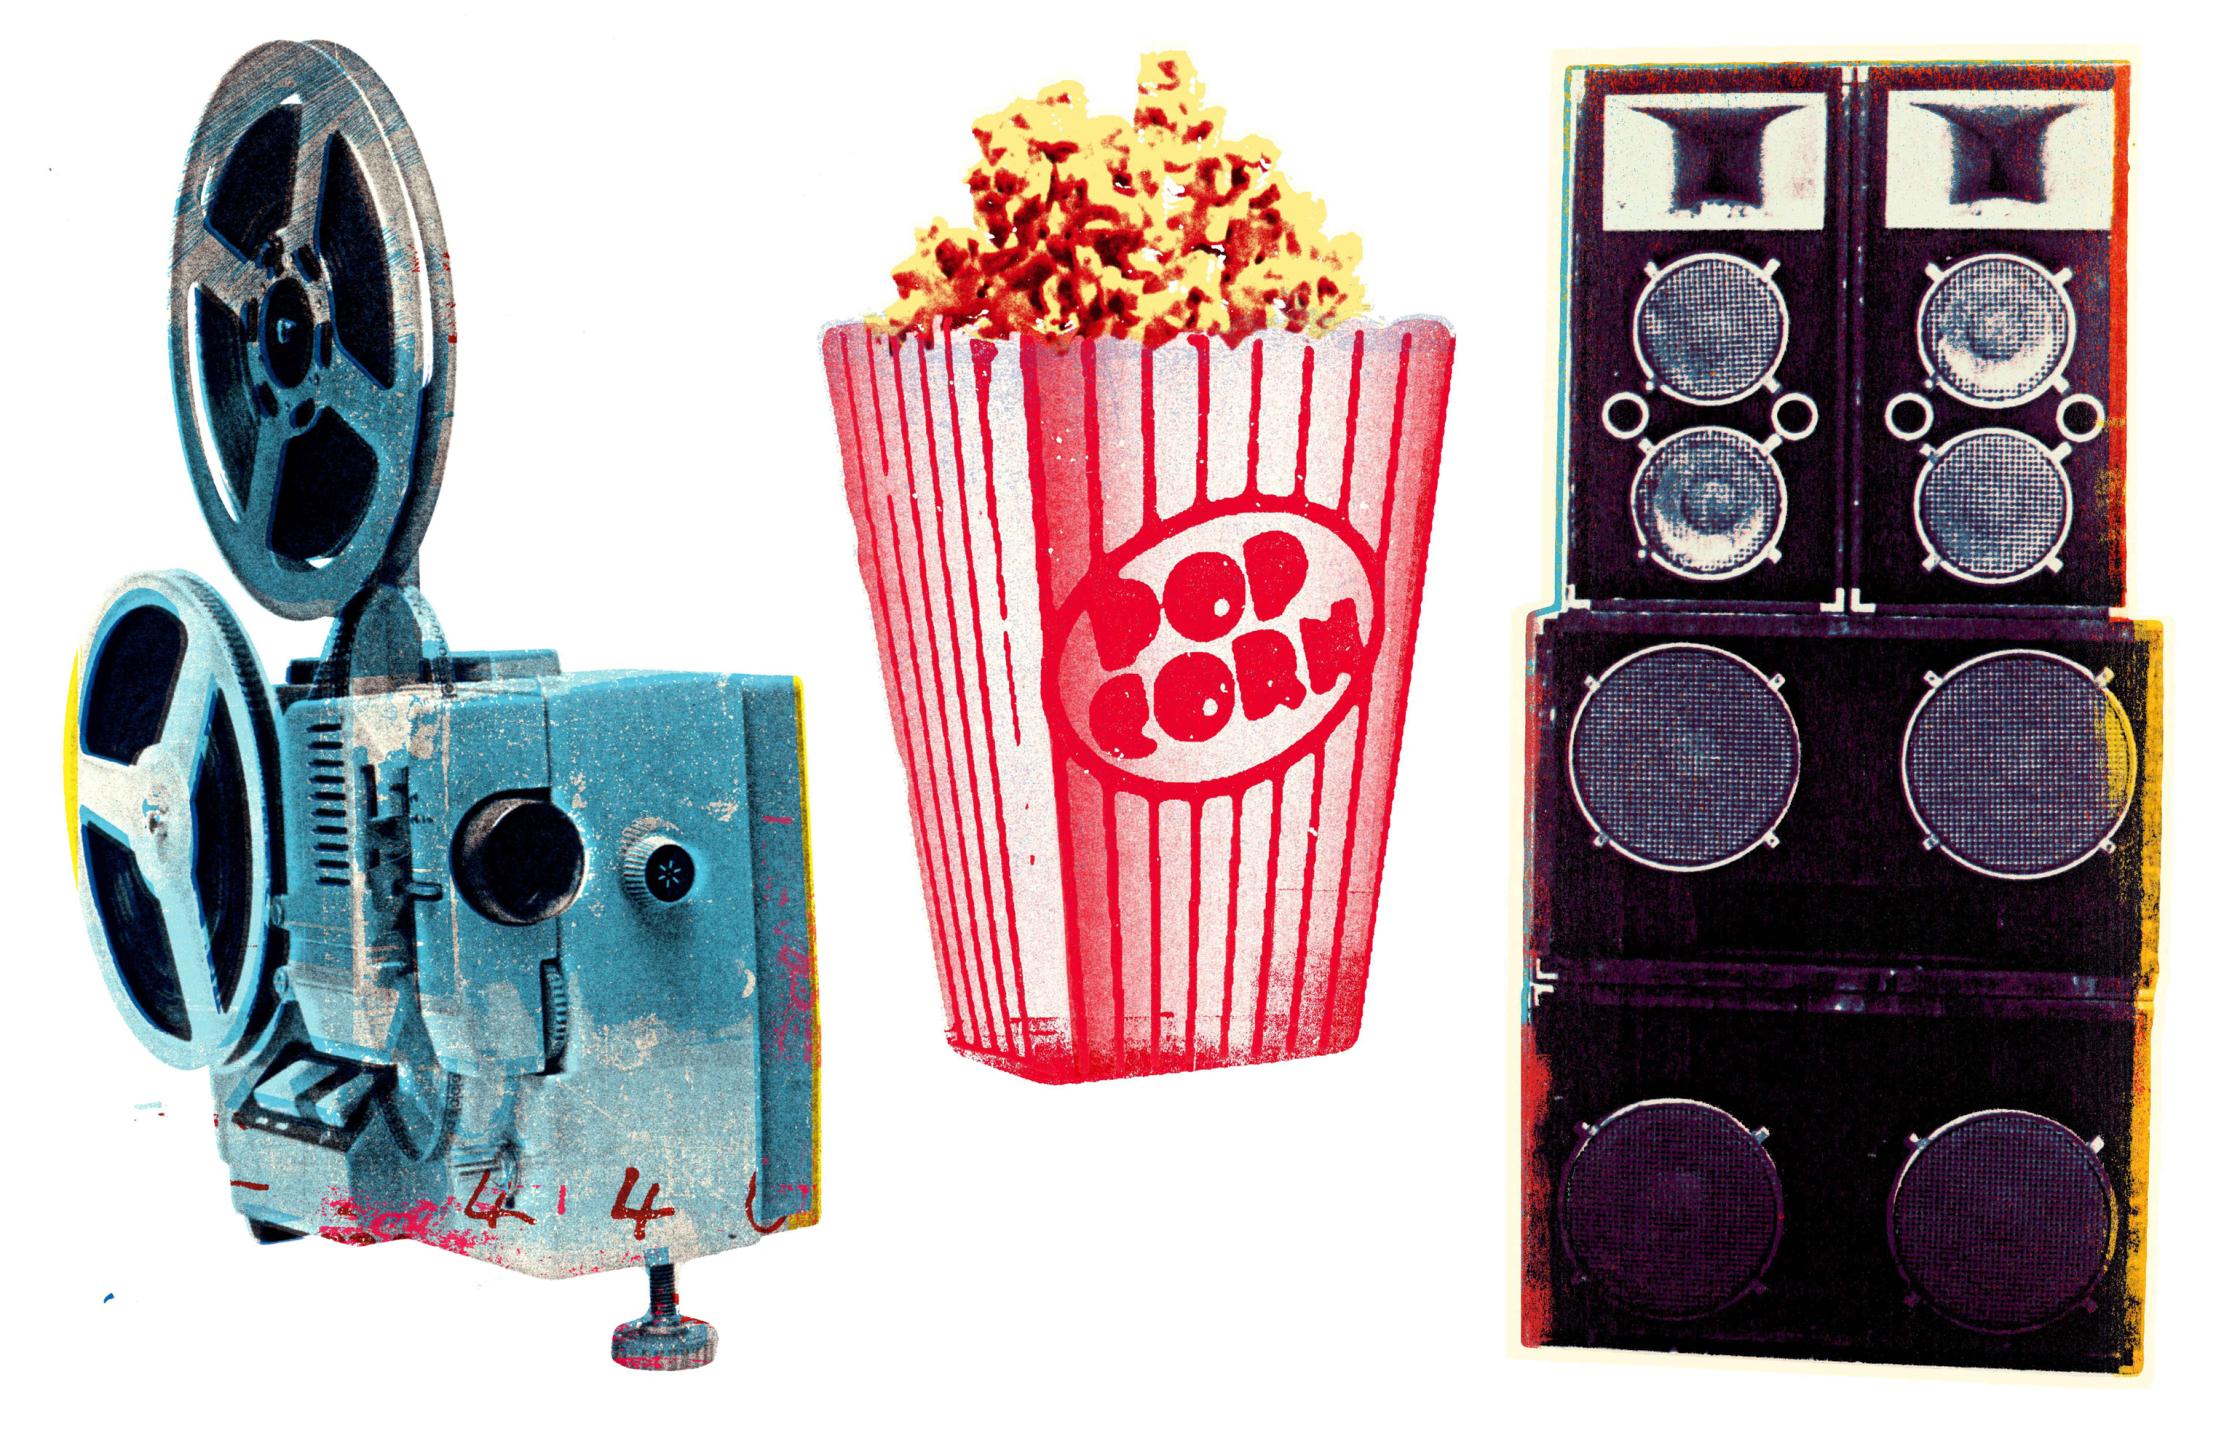 Virgin Mobile Canada Popcorn, Movies + Speakers